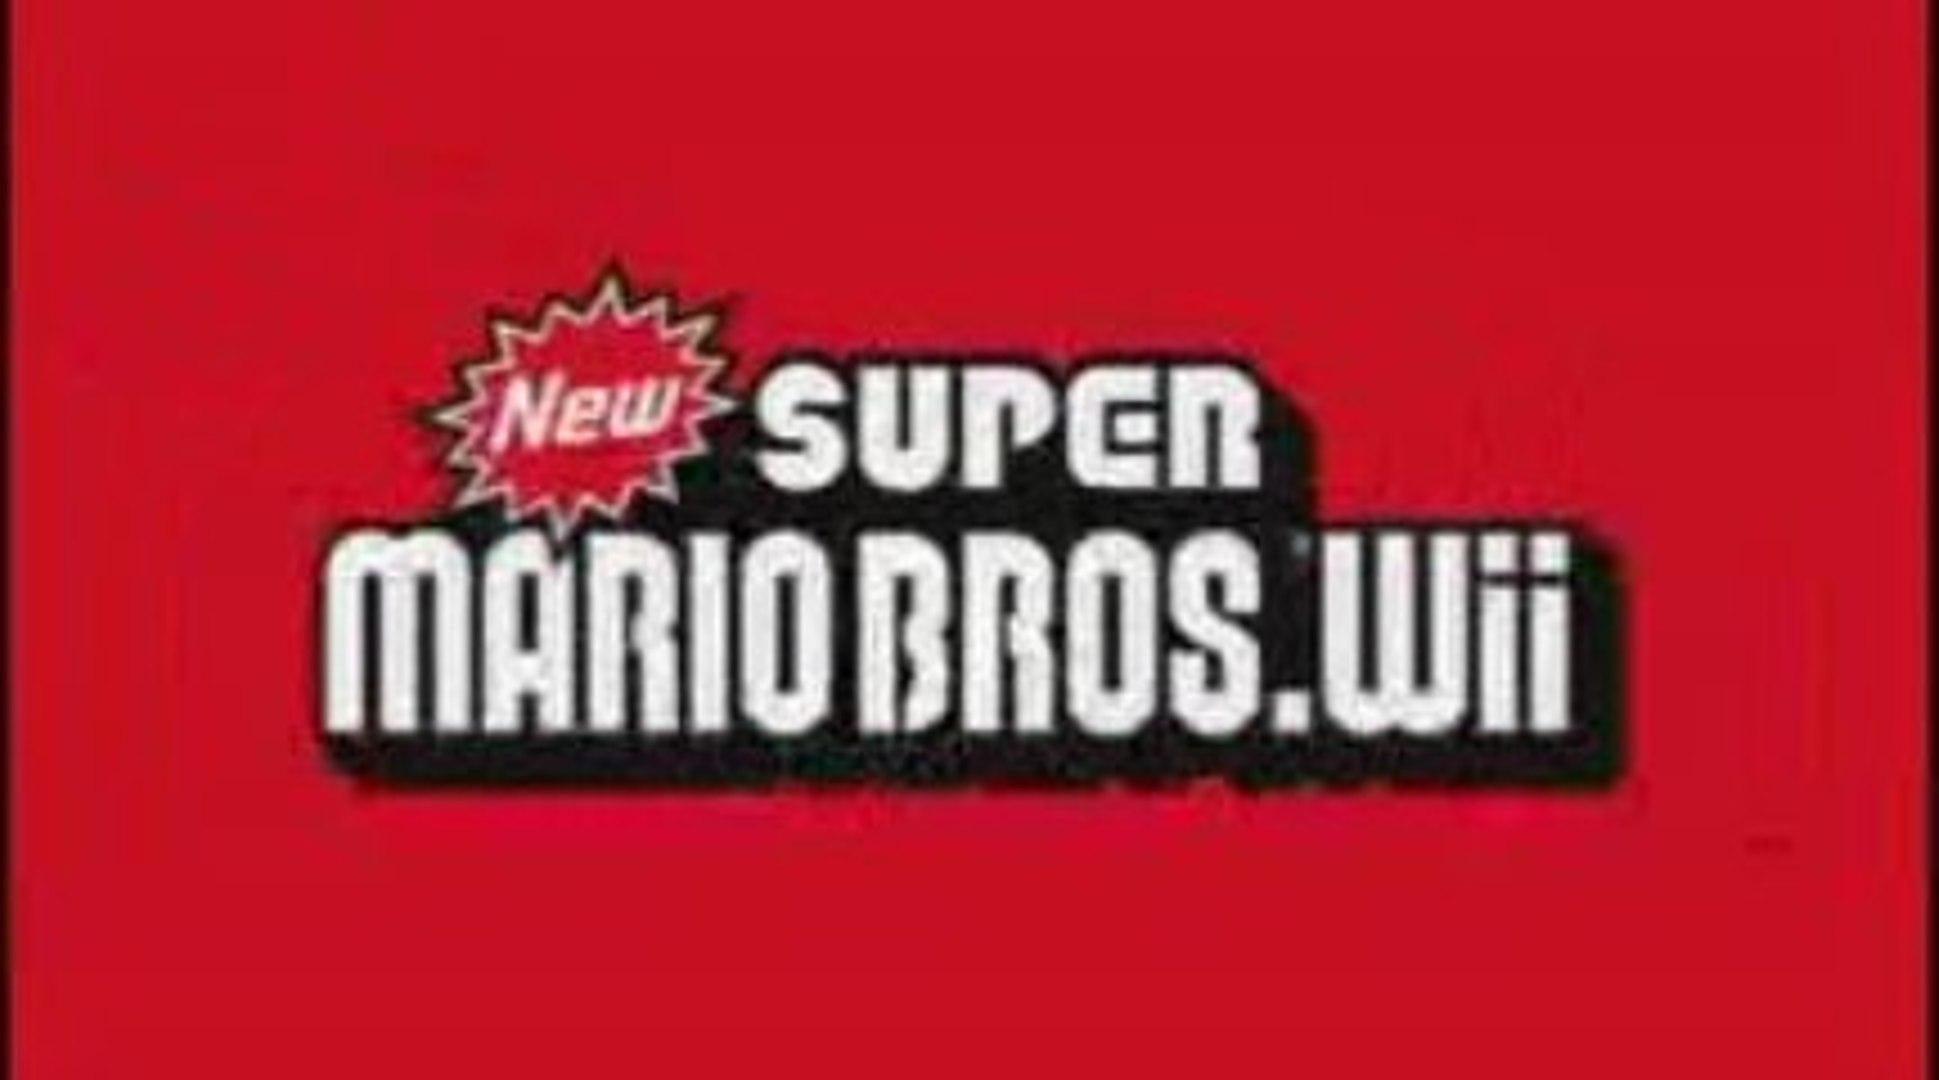 New Super Mario Bros. Wii - E3 2009 : Gameplay